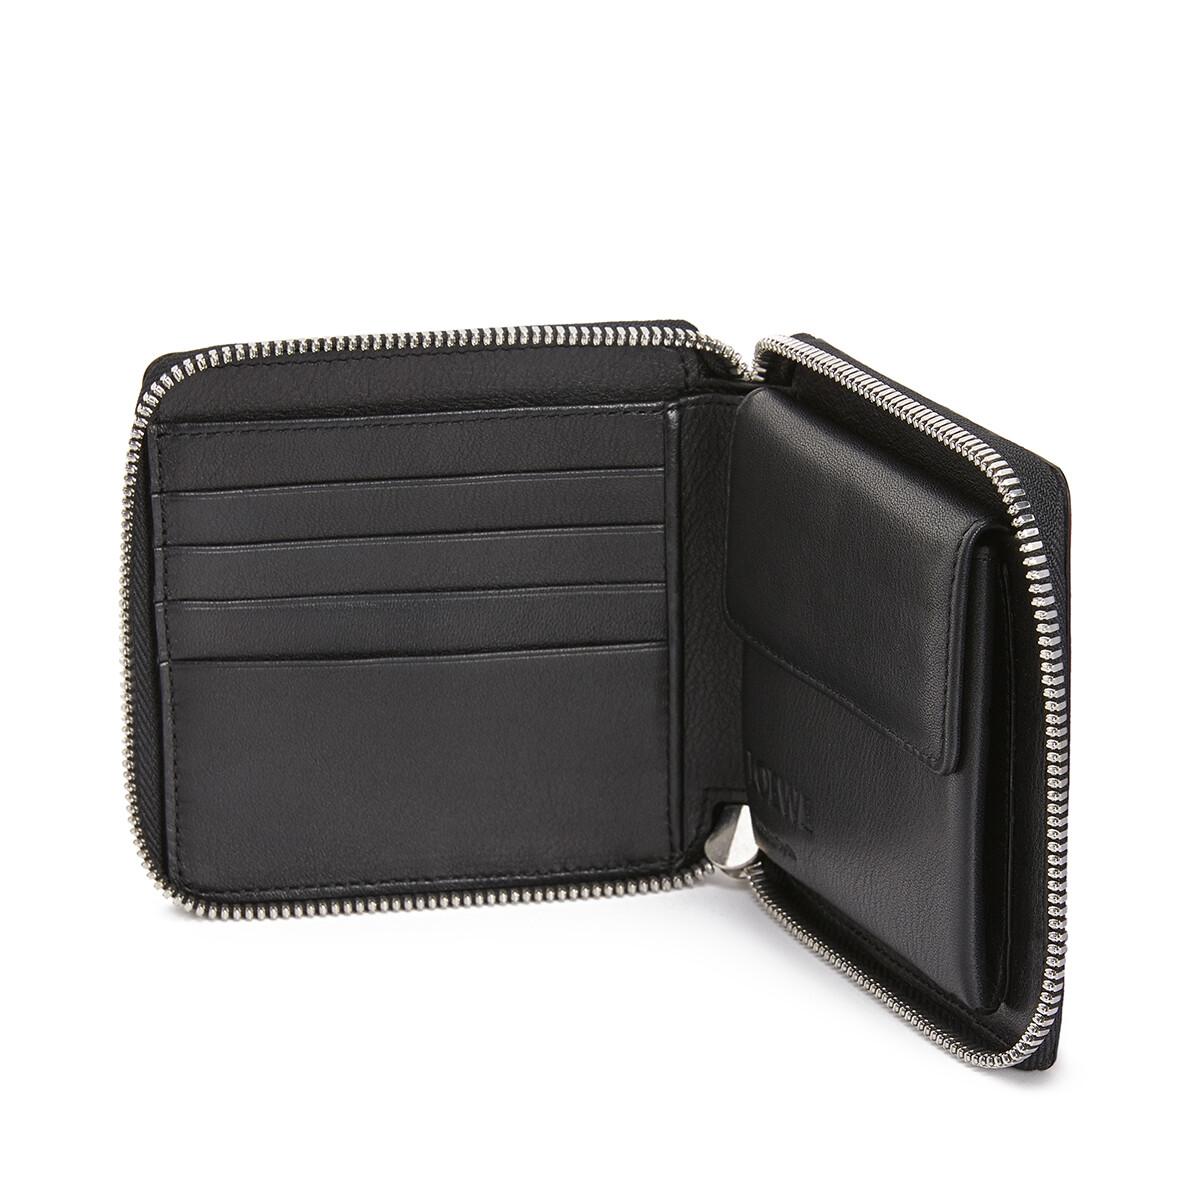 LOEWE Square Zip Wallet Animals Black/Red front